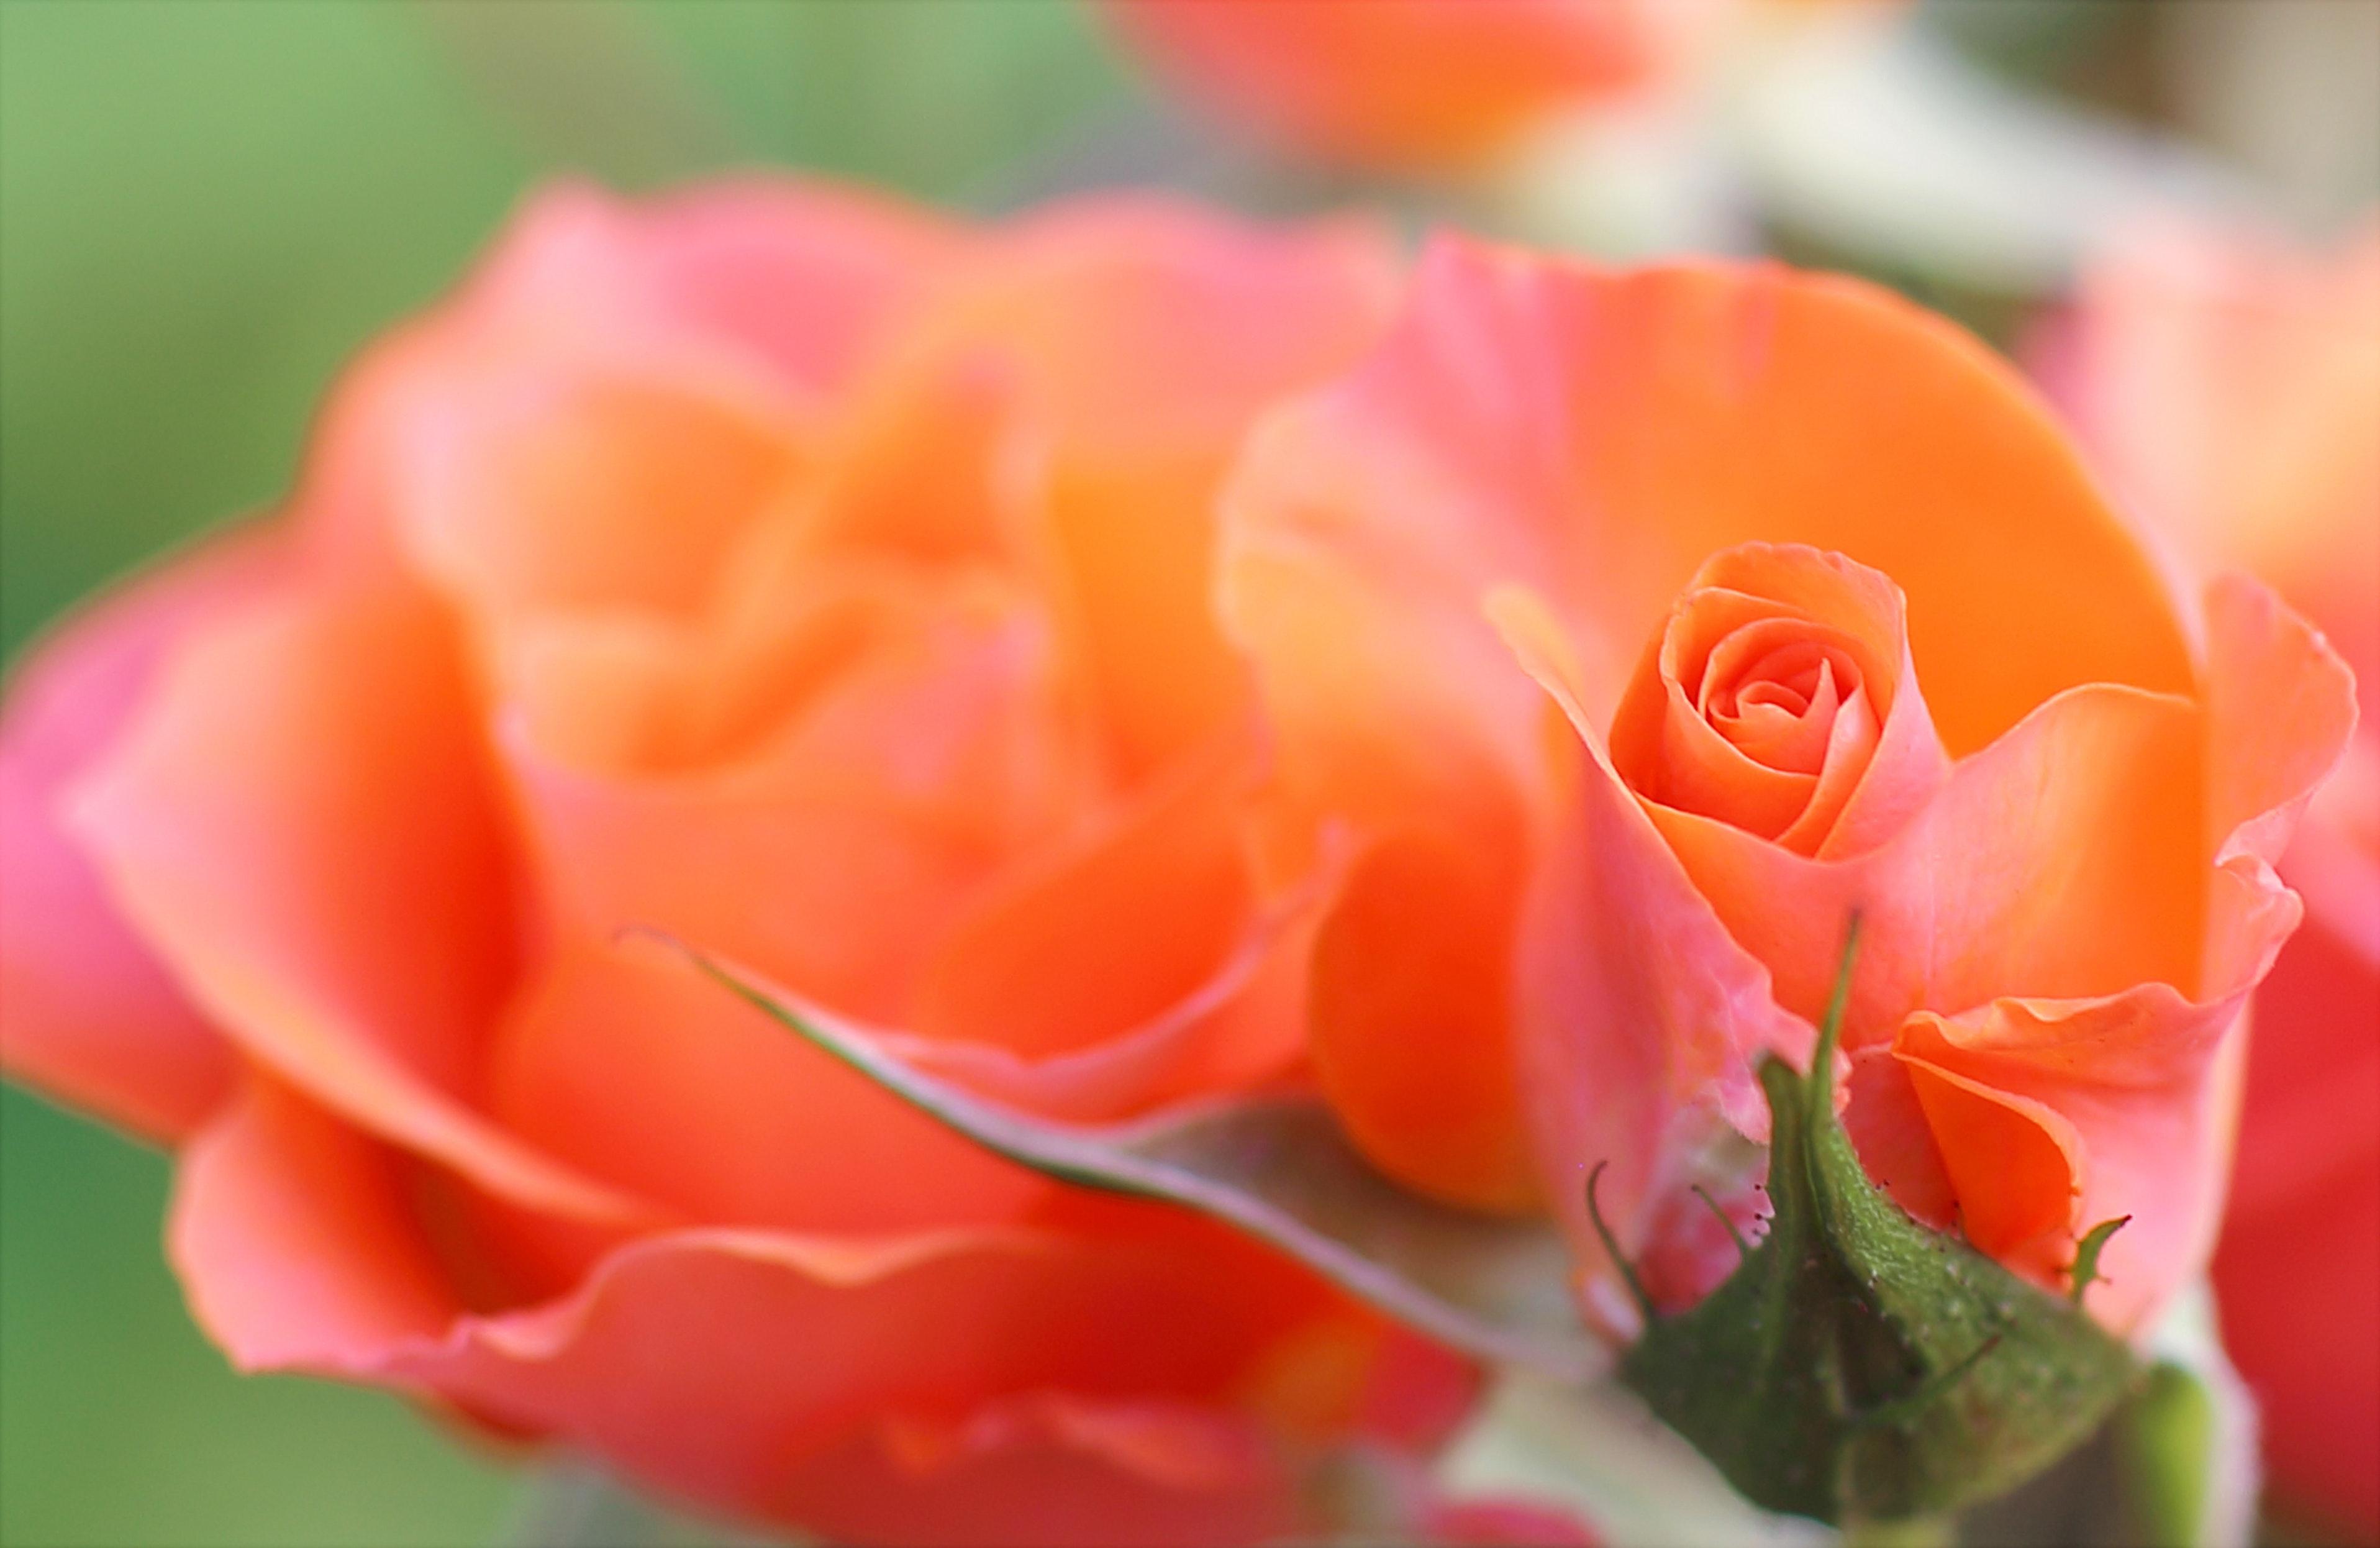 Orange and pink flower photo